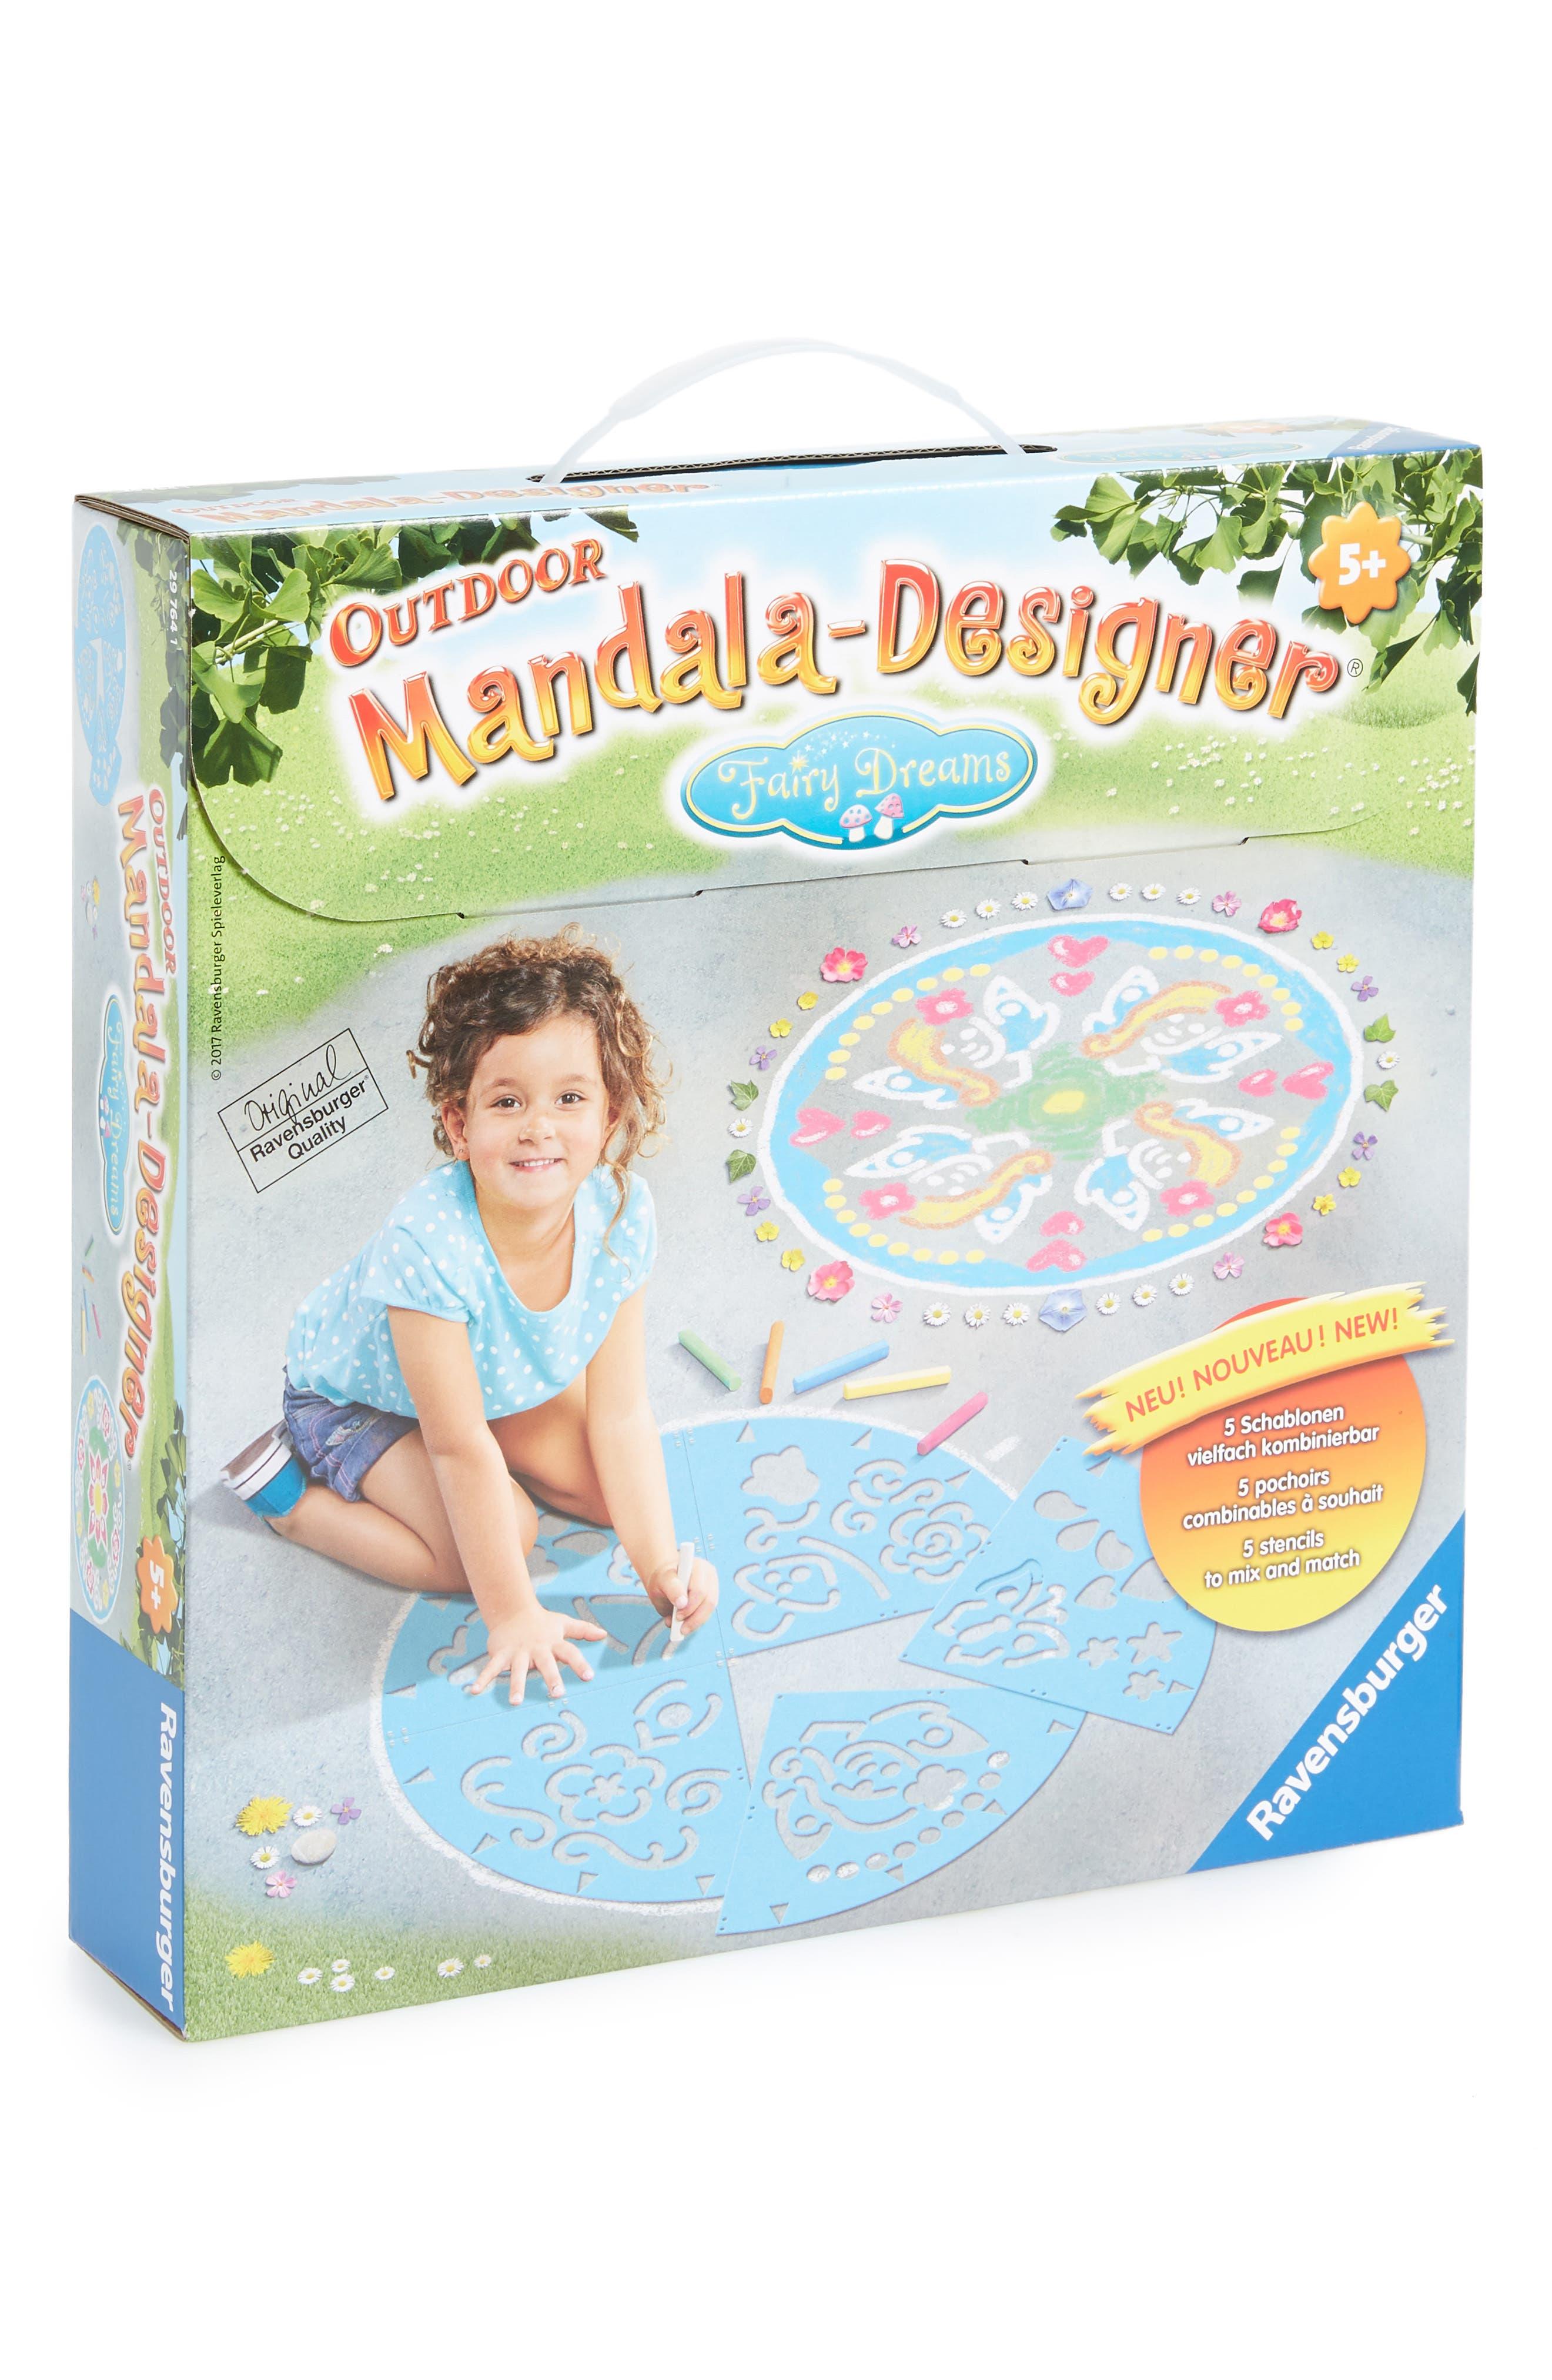 Outdoor Mandala Designer Fairy Dreams Chalk Kit,                         Main,                         color, 400